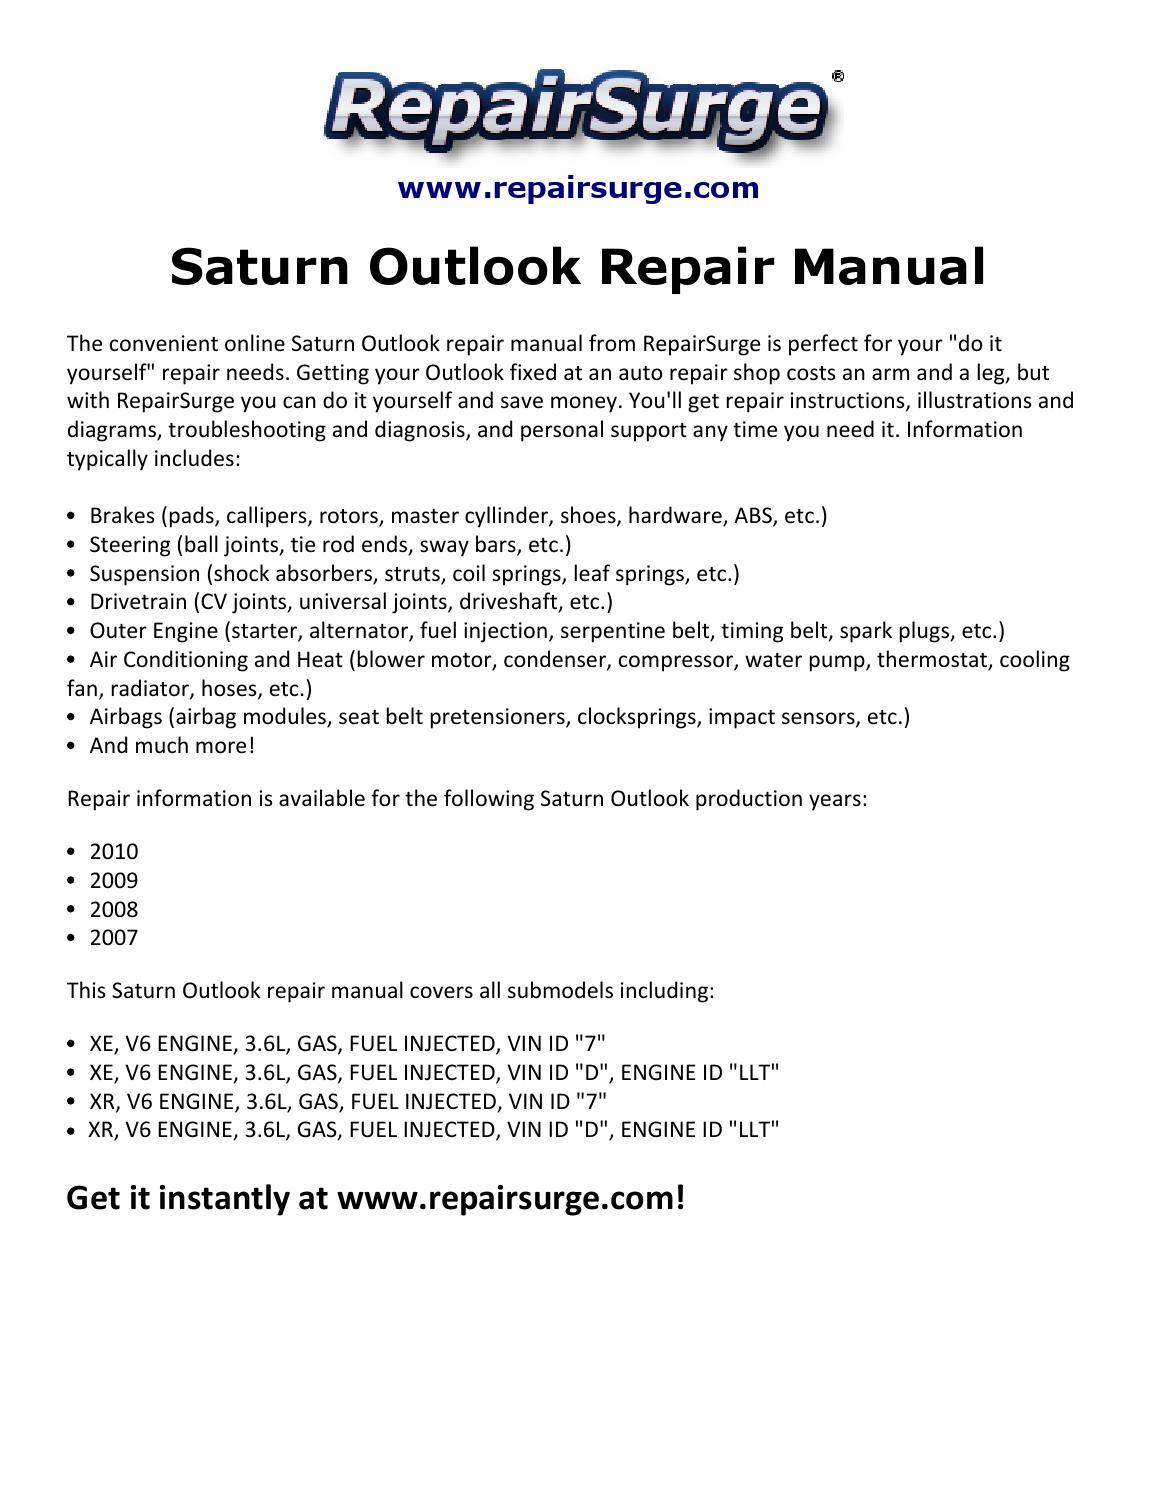 Saturn Outlook Repair Manual 2007 2010 By Albert998 Issuu 3 6l V6 Engine Diagram